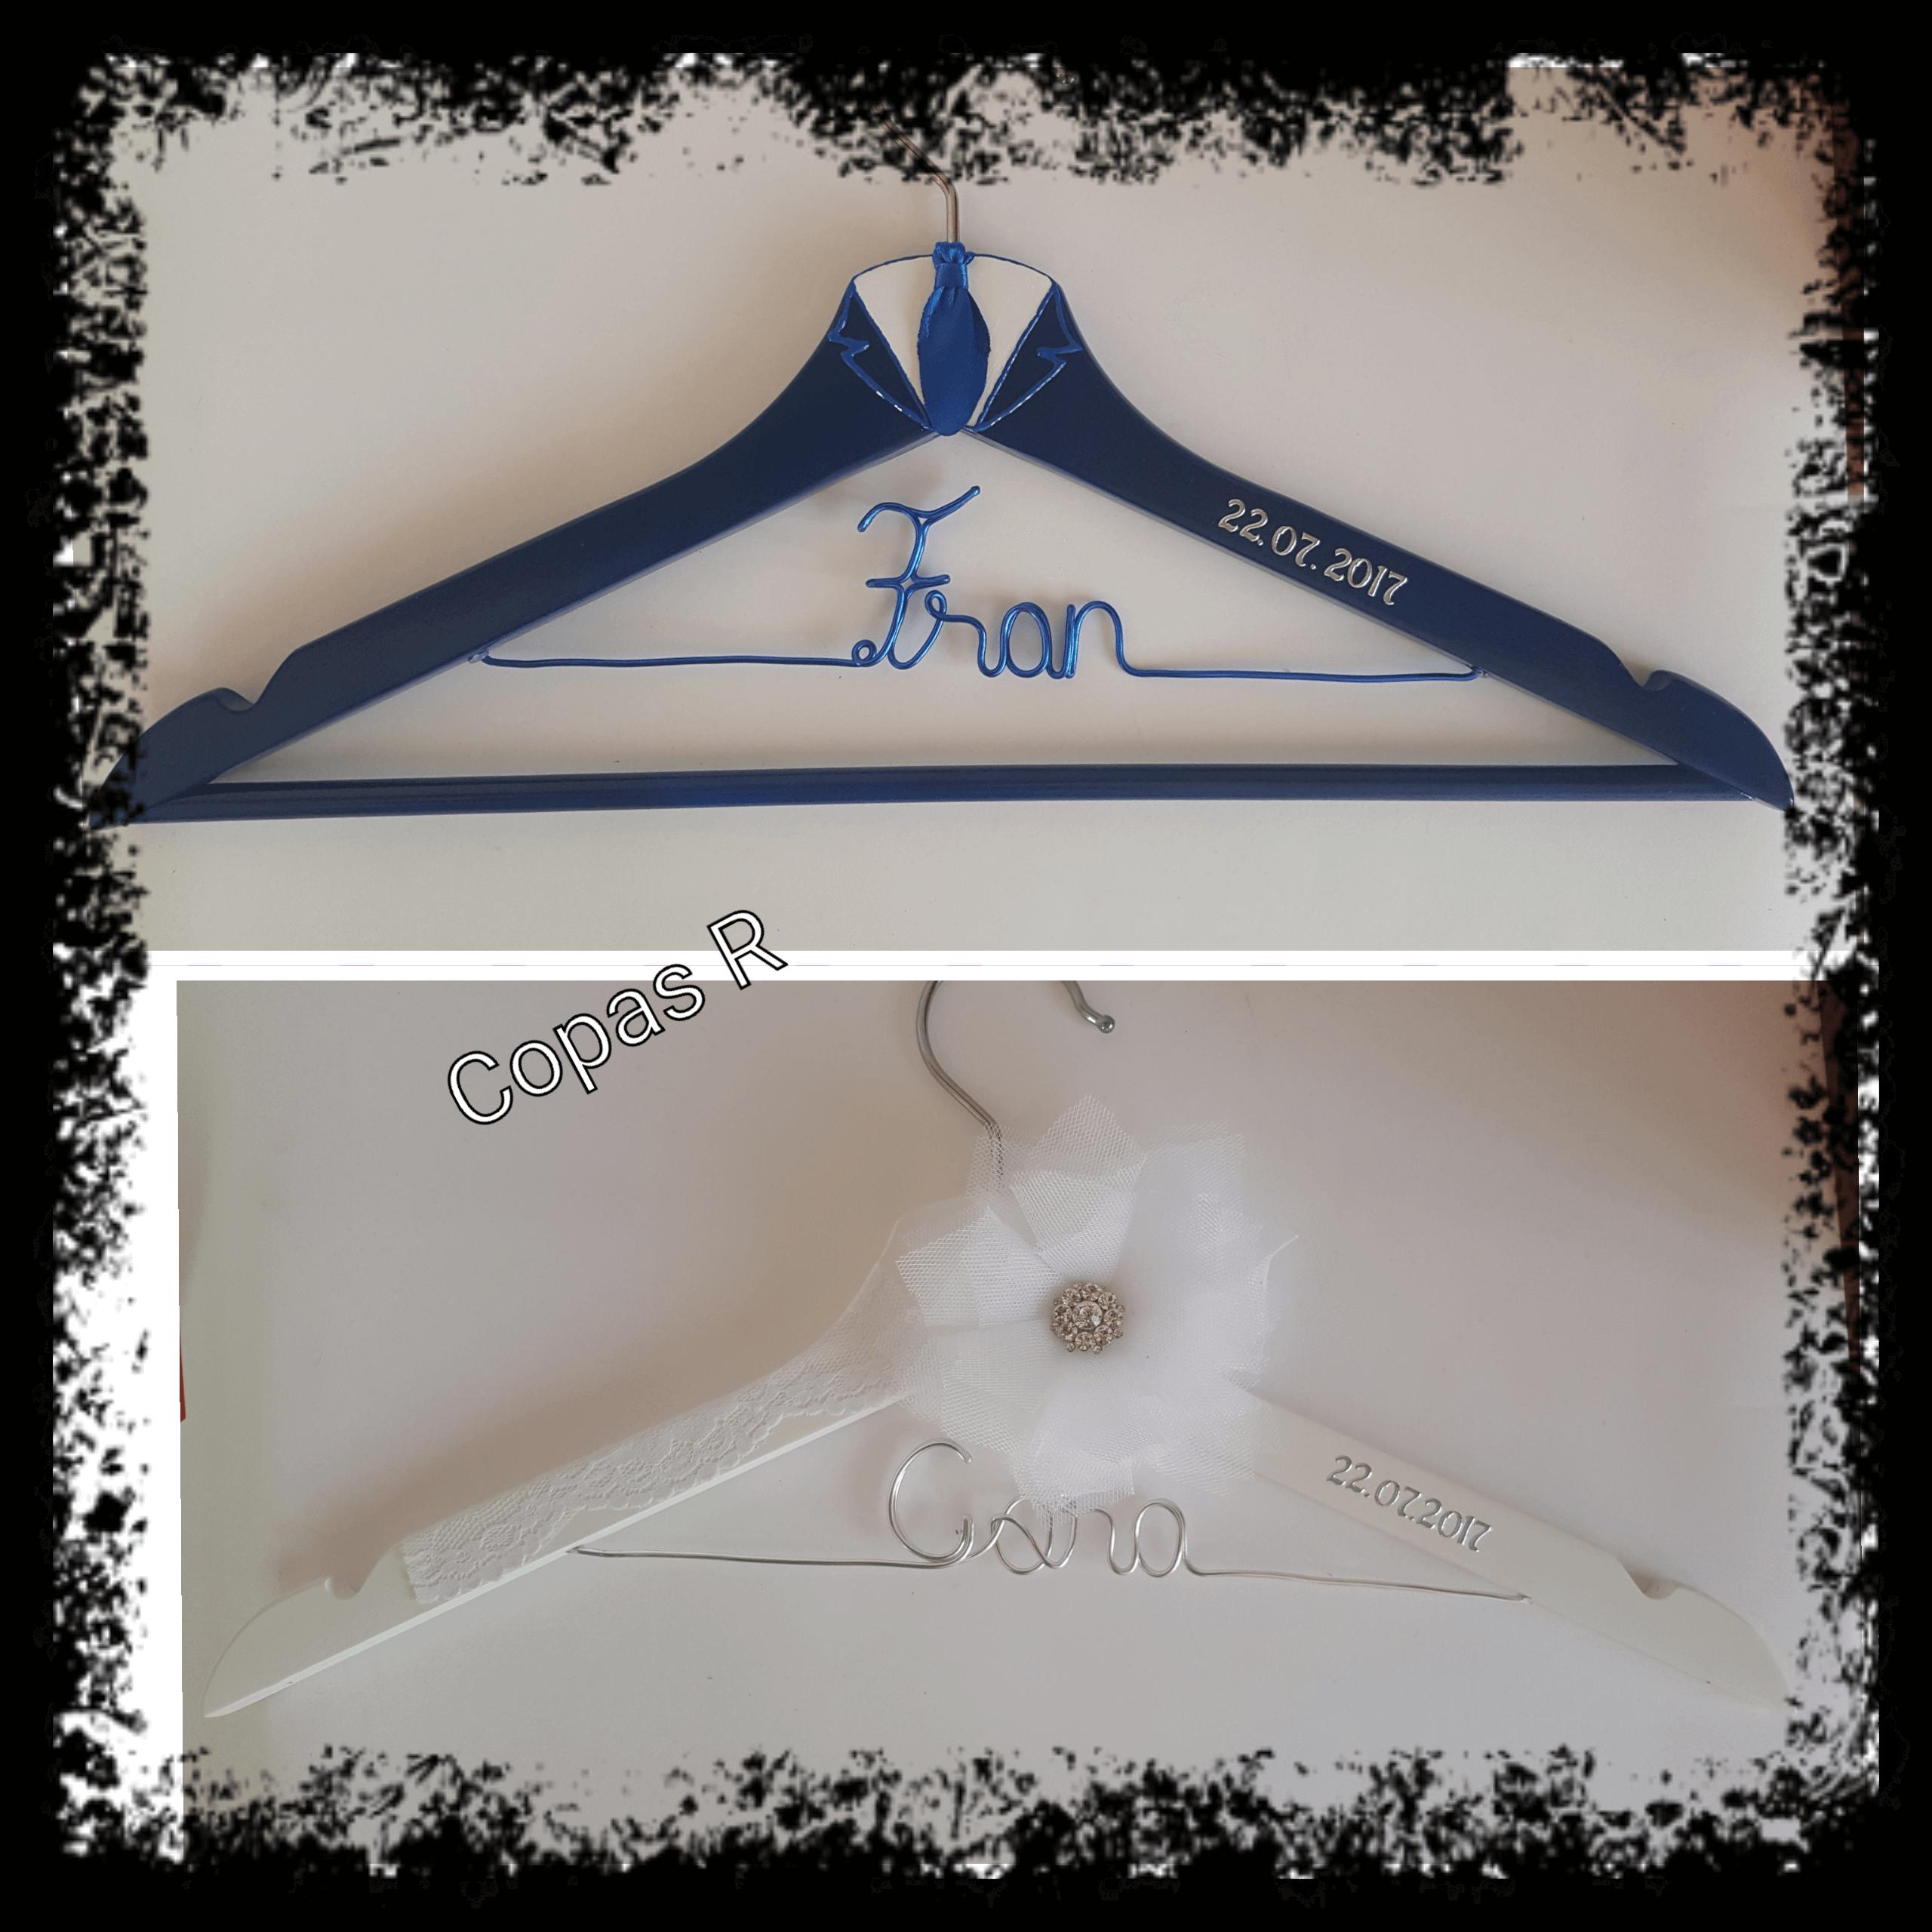 perchas personalizadas perchas personalizadas - perchas personalizadas 6 - Perchas personalizadas | perchas novios | perchas personalizadas boda